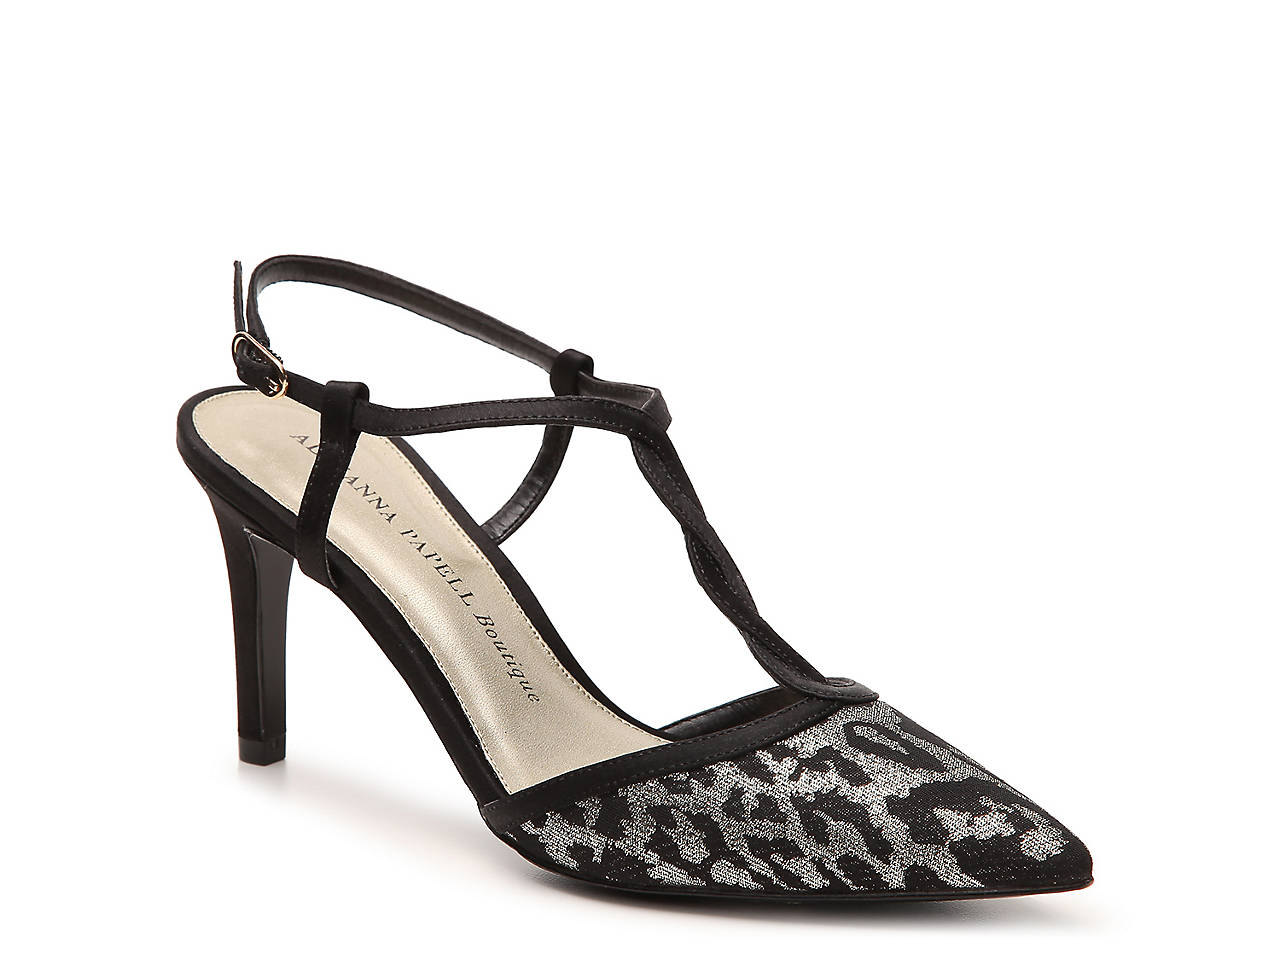 95eccb1909cd Adrianna Papell Boutique Hannah Metallic Leopard Pump Women s Shoes ...